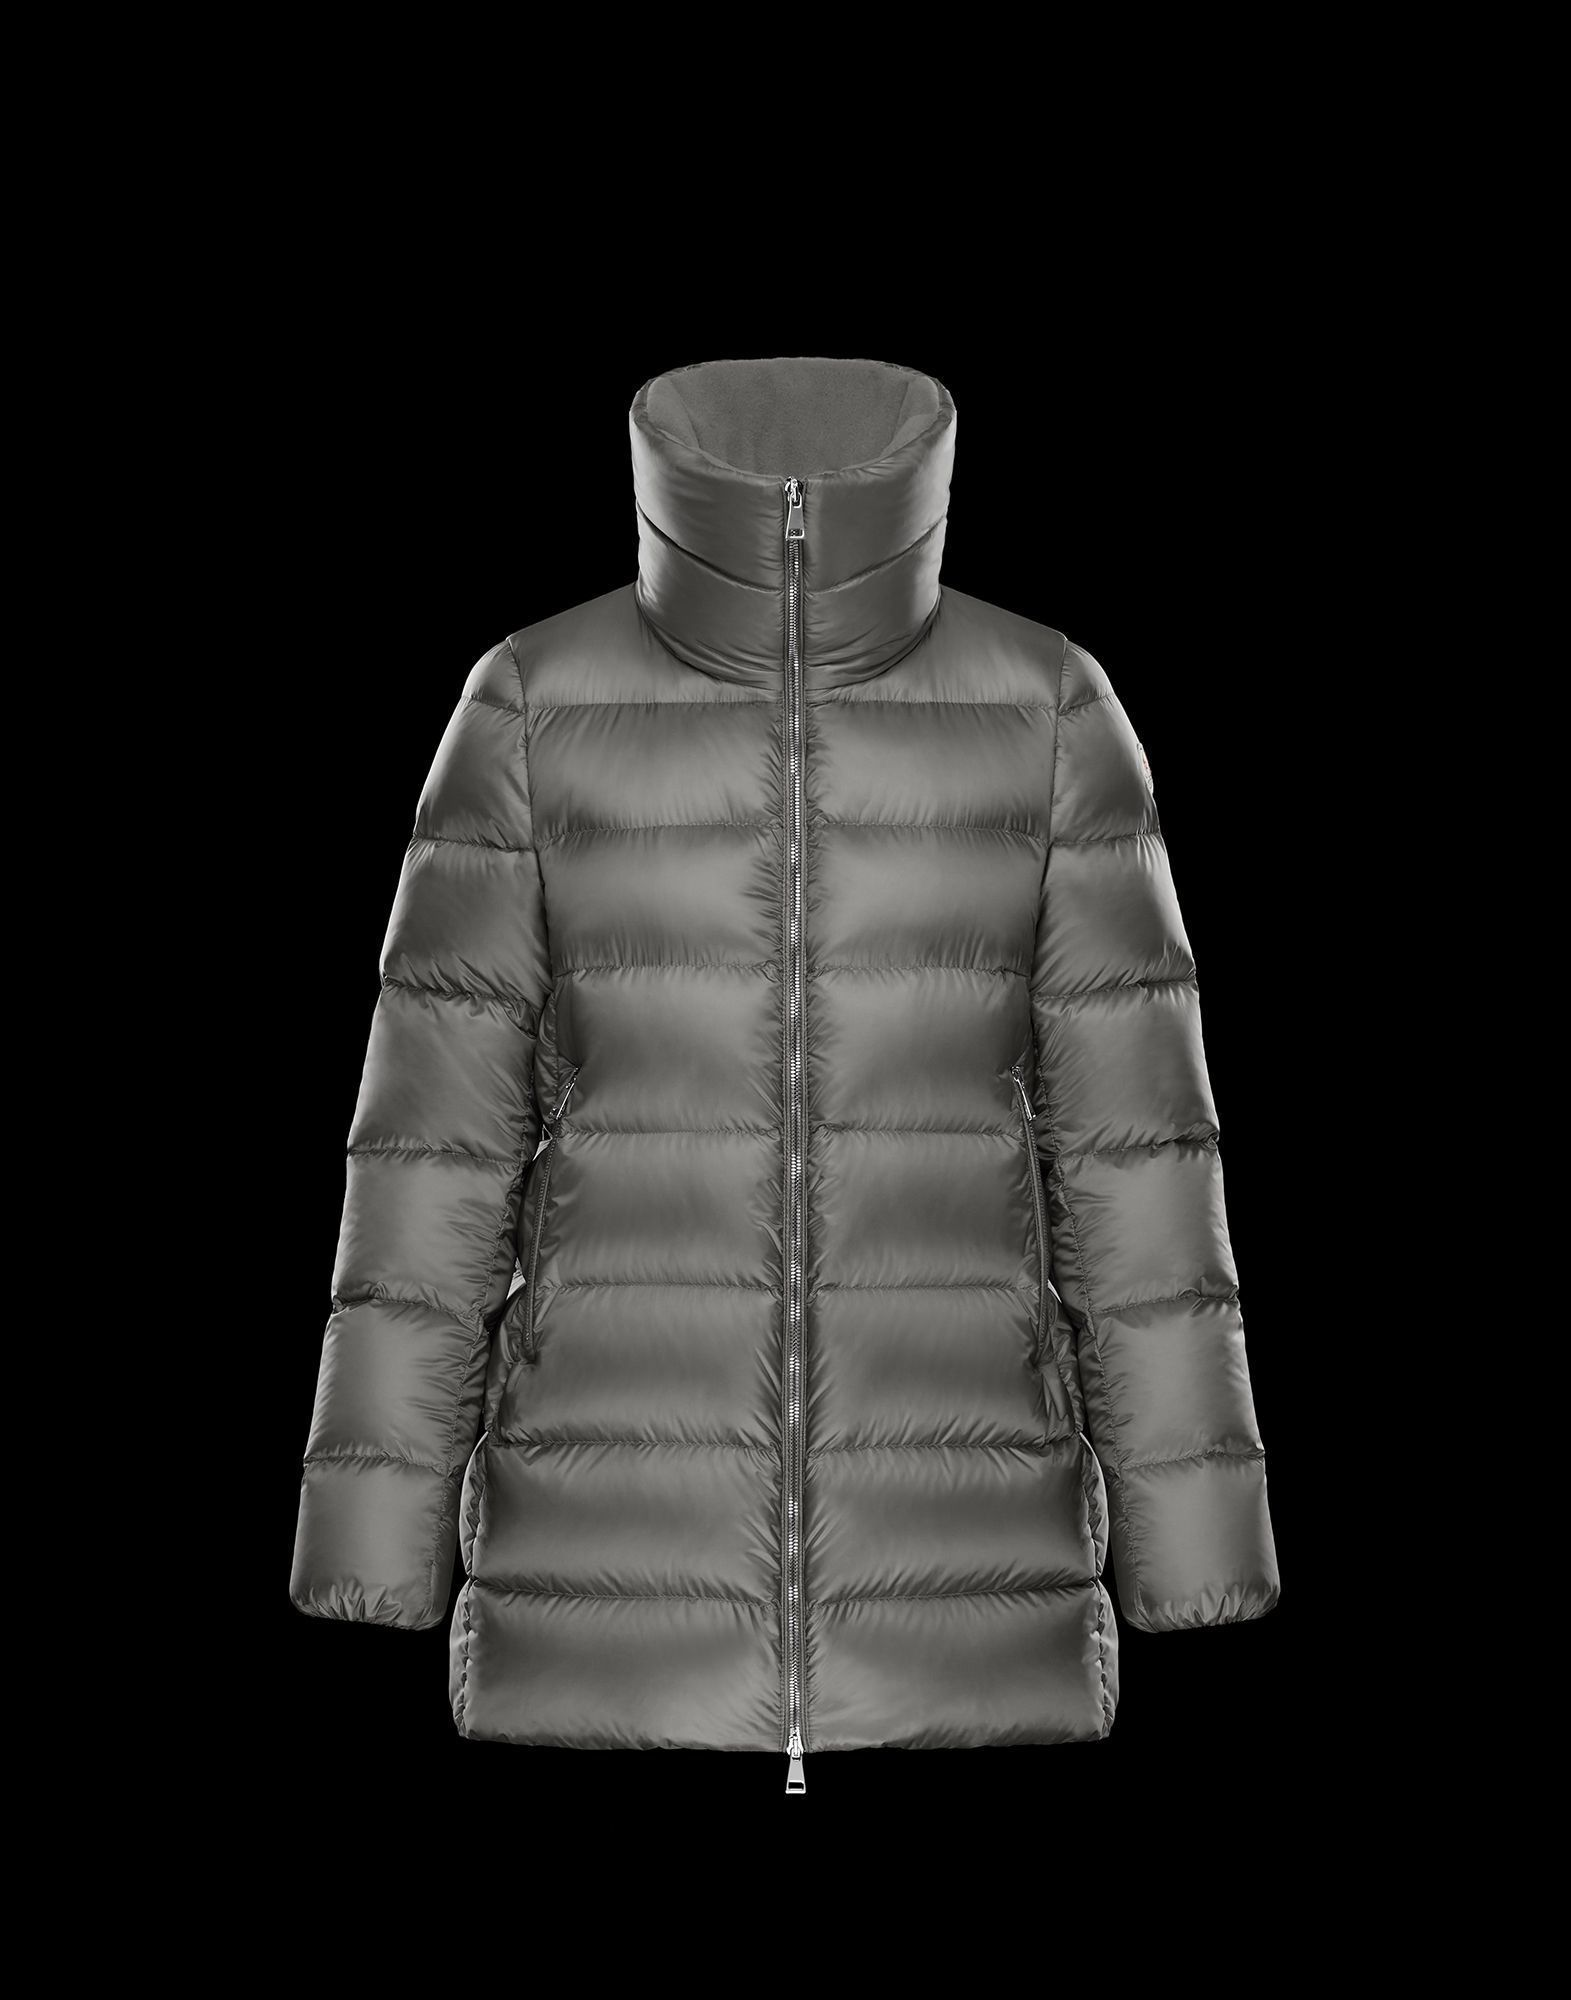 MONCLER Down Jackets 17-18 AW MONCLER TORCYN cashmere blend down jacket Milan 11